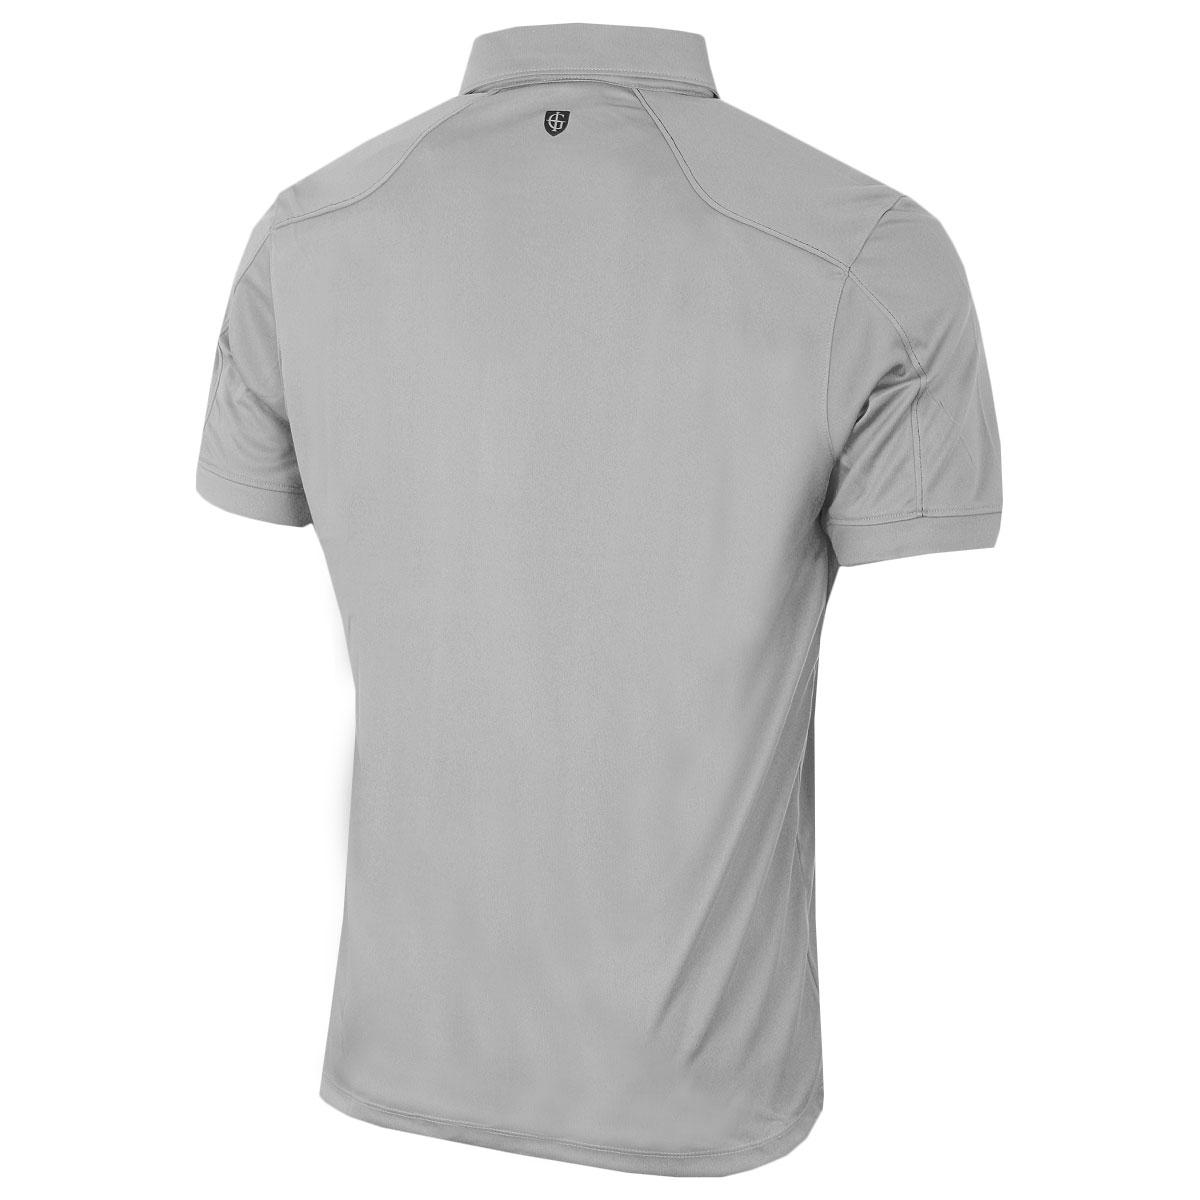 Island-Green-Mens-Golf-IGTS1648-Performance-Coolpass-Polo-Shirt-39-OFF-RRP thumbnail 18